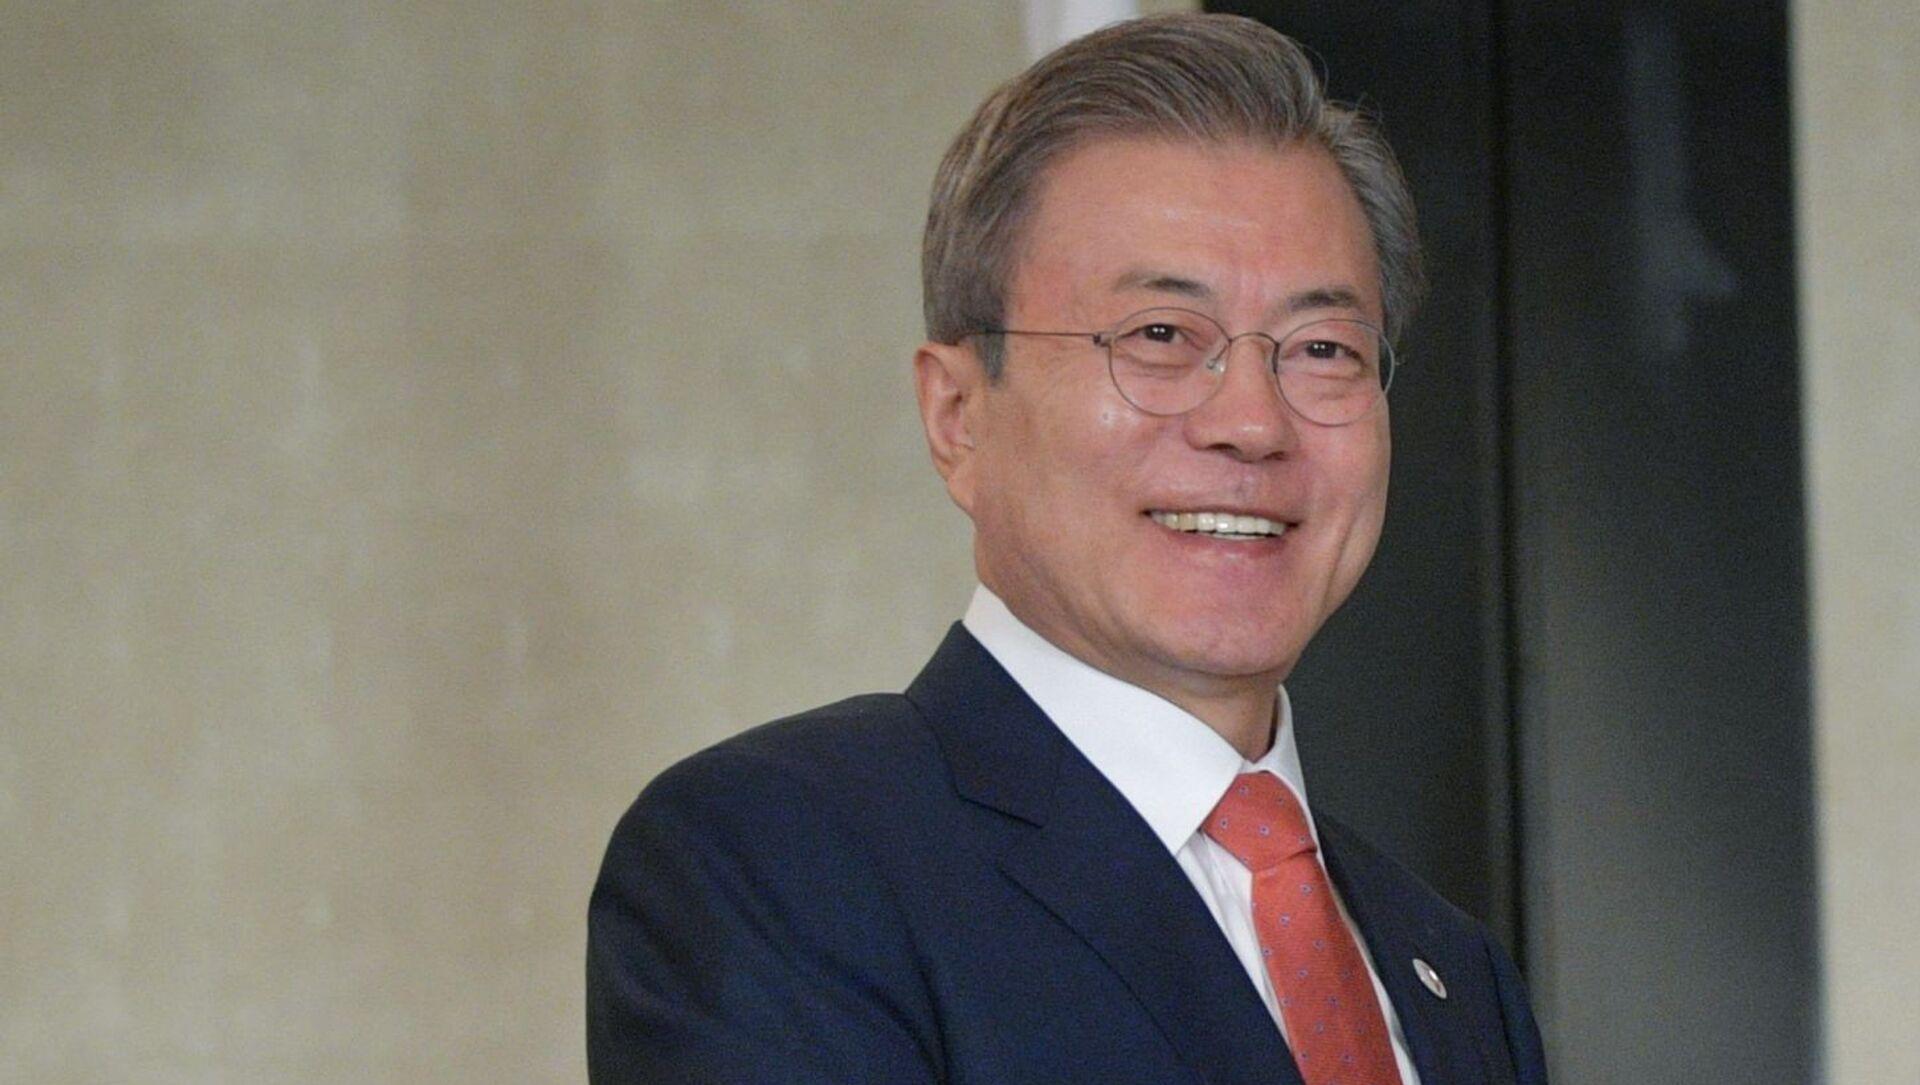 President of South Korea Moon Jae-in - Sputnik International, 1920, 01.08.2021